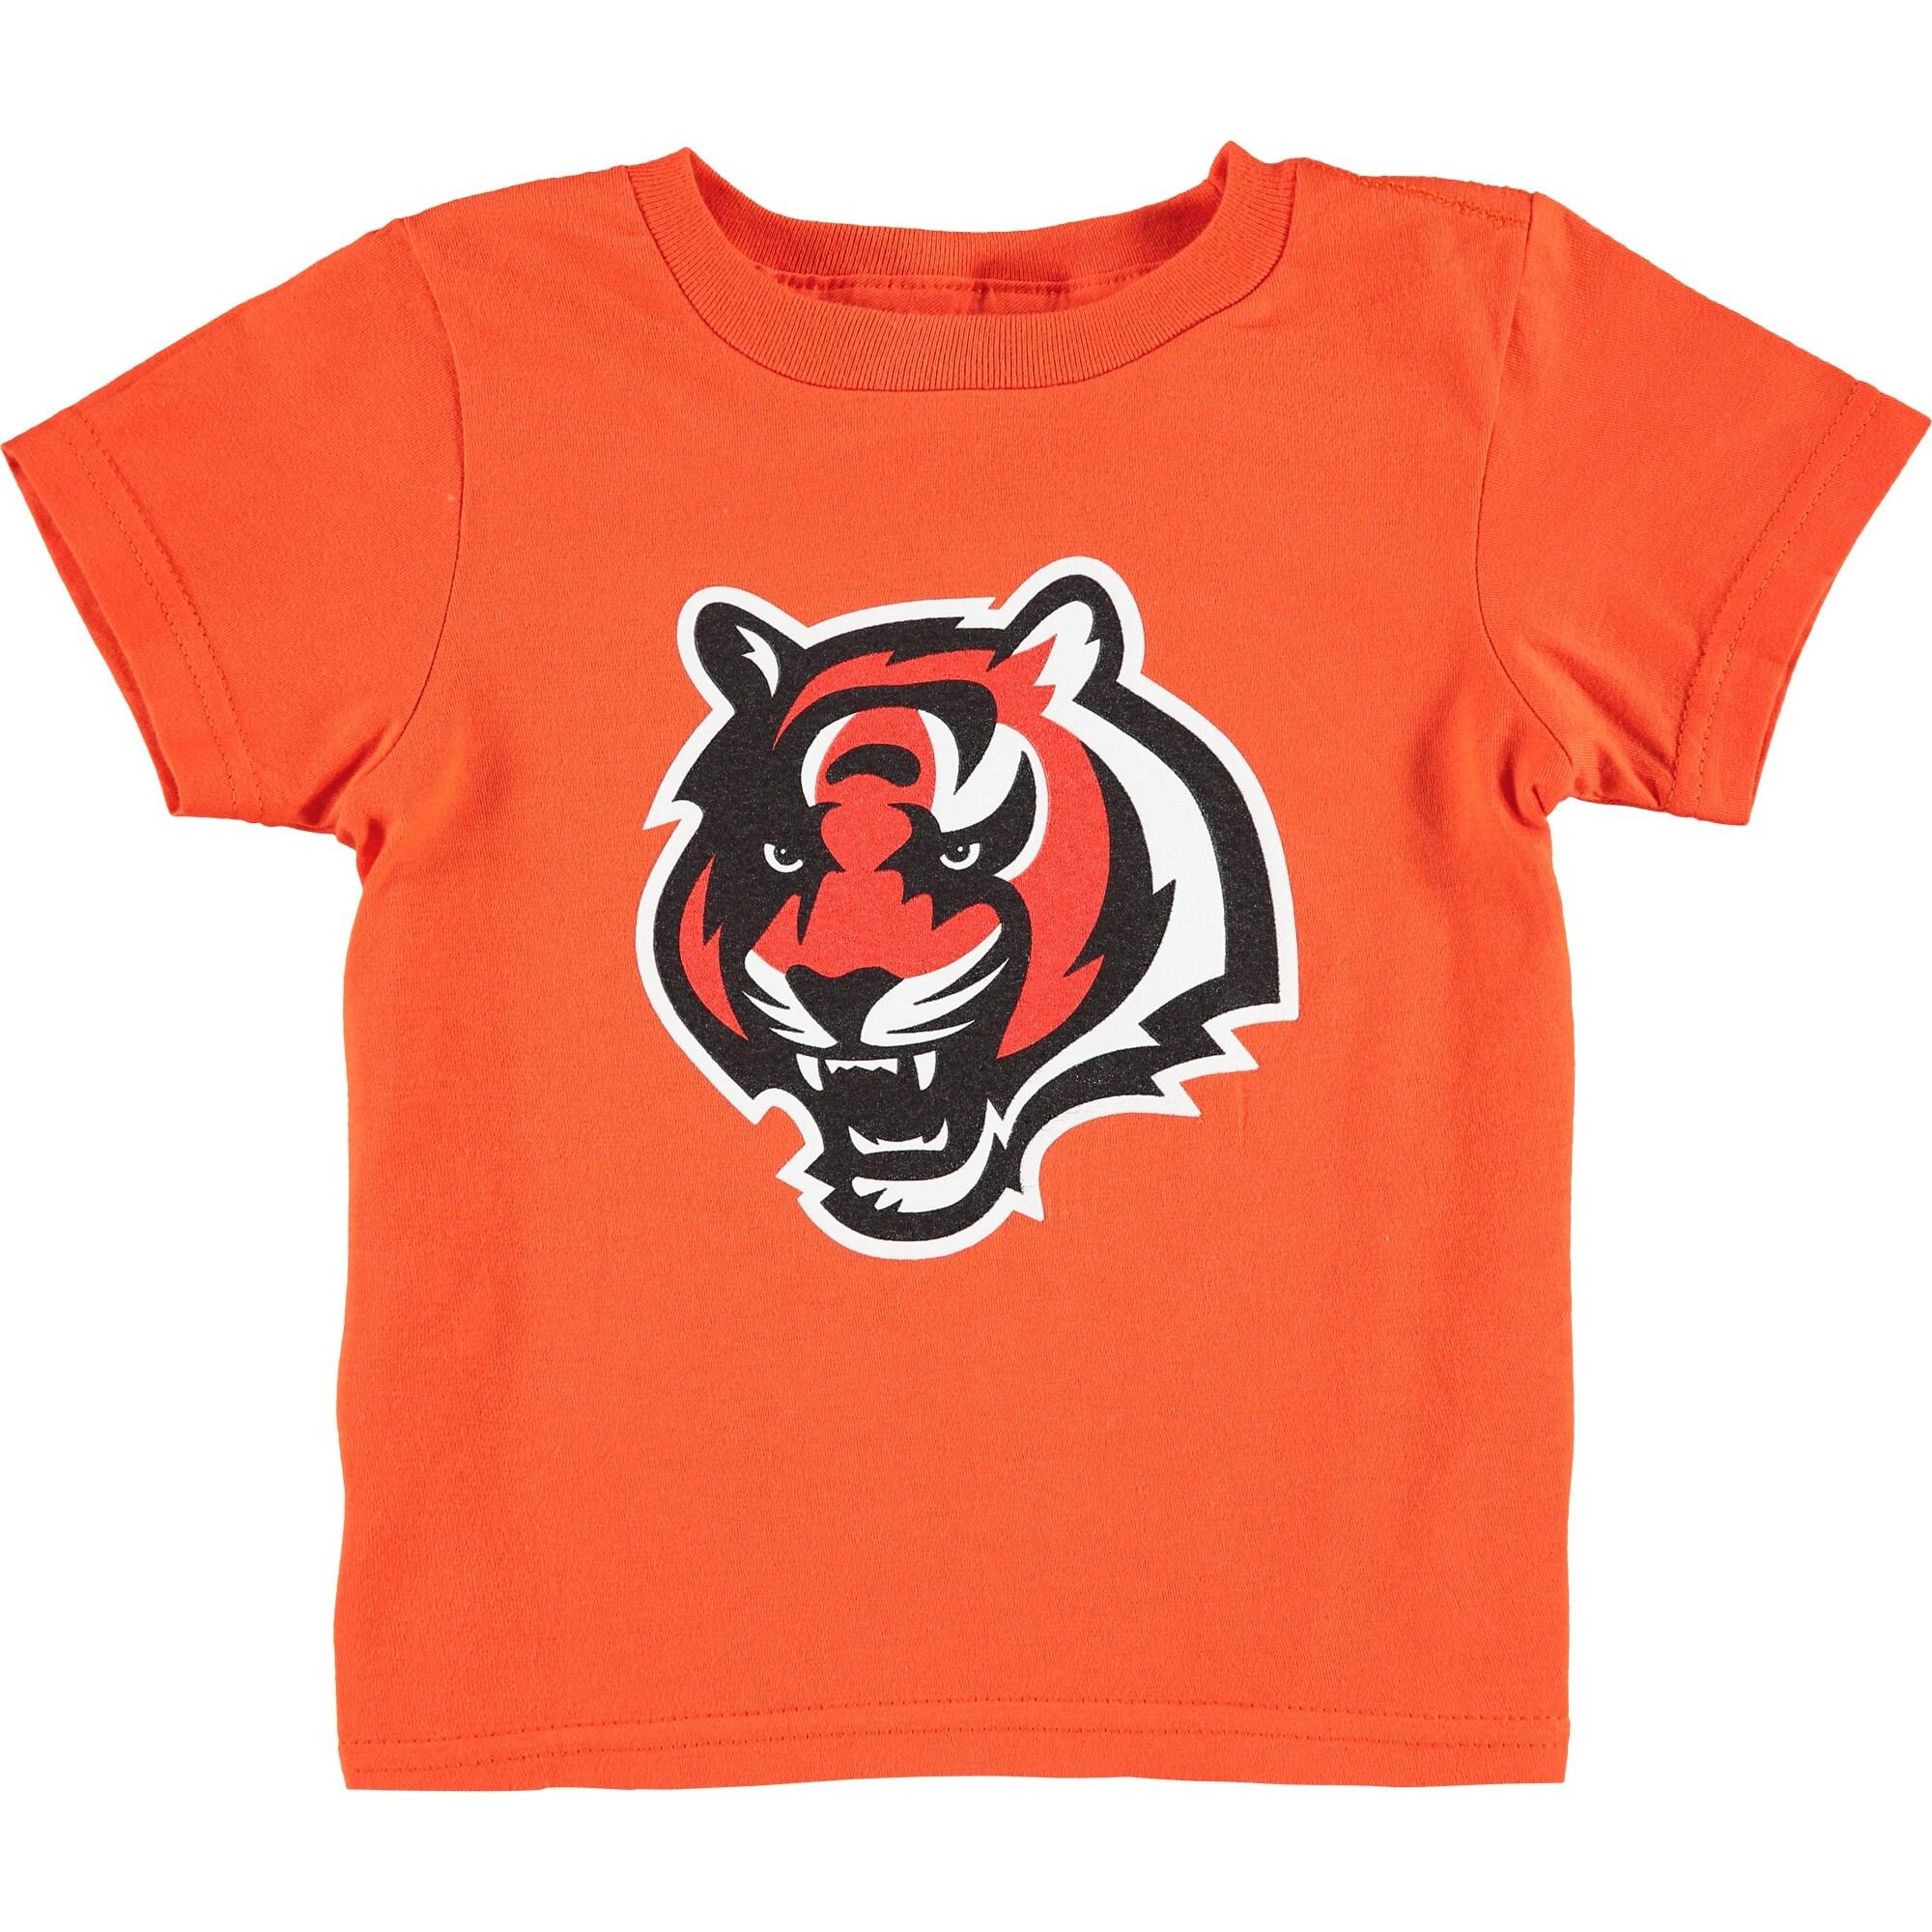 Cincinnati Bengals Toddler Team Logo T-Shirt - Orange